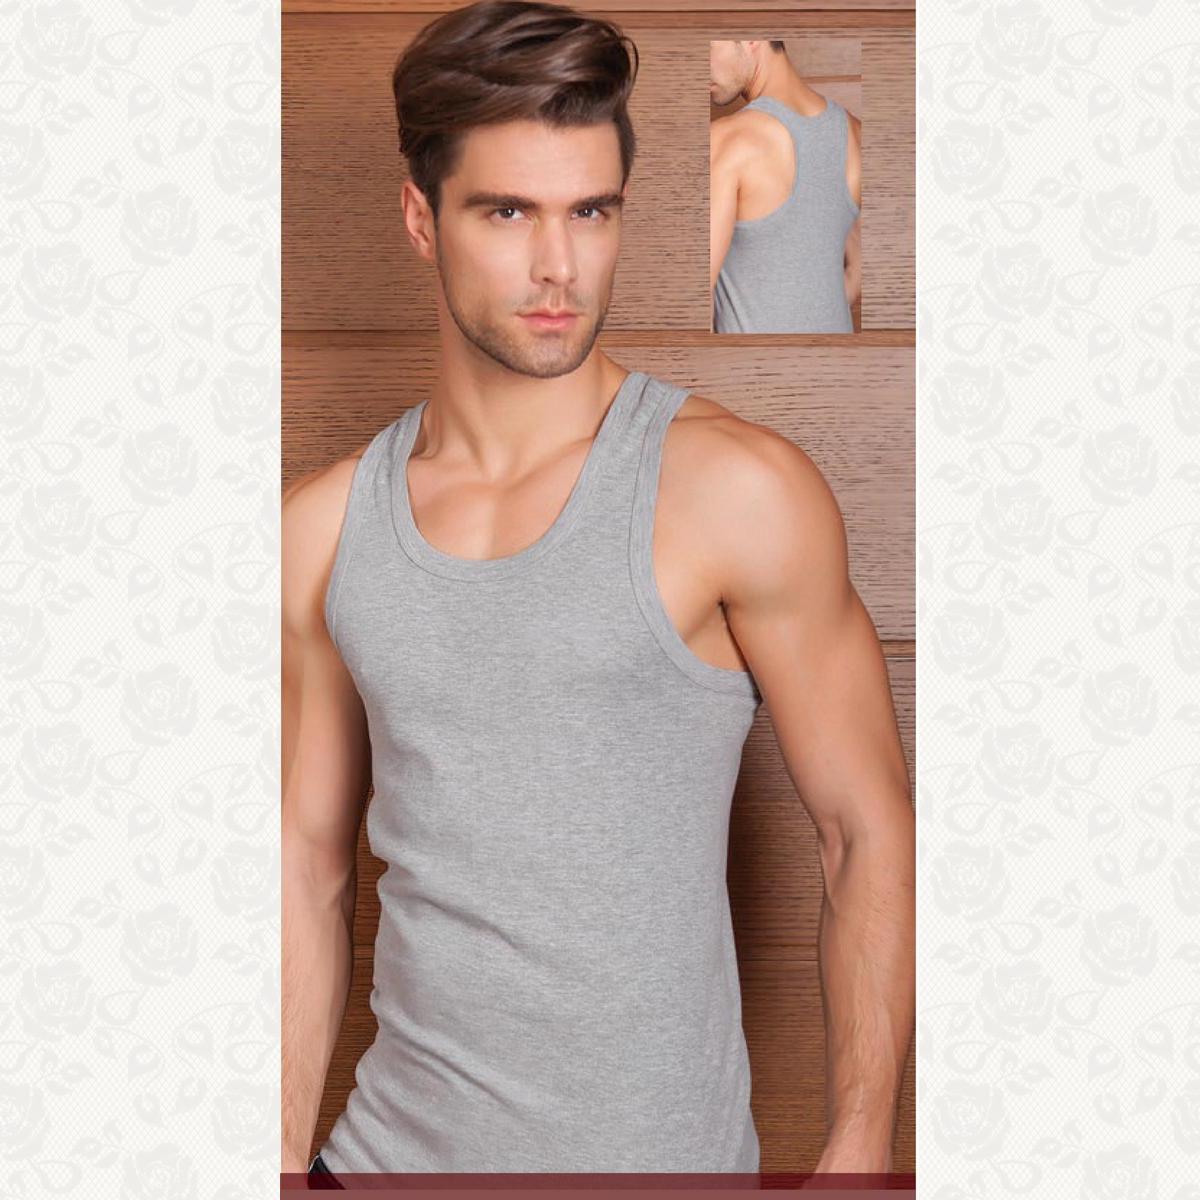 Майка мужская борцовка , цвет светло серый с фото